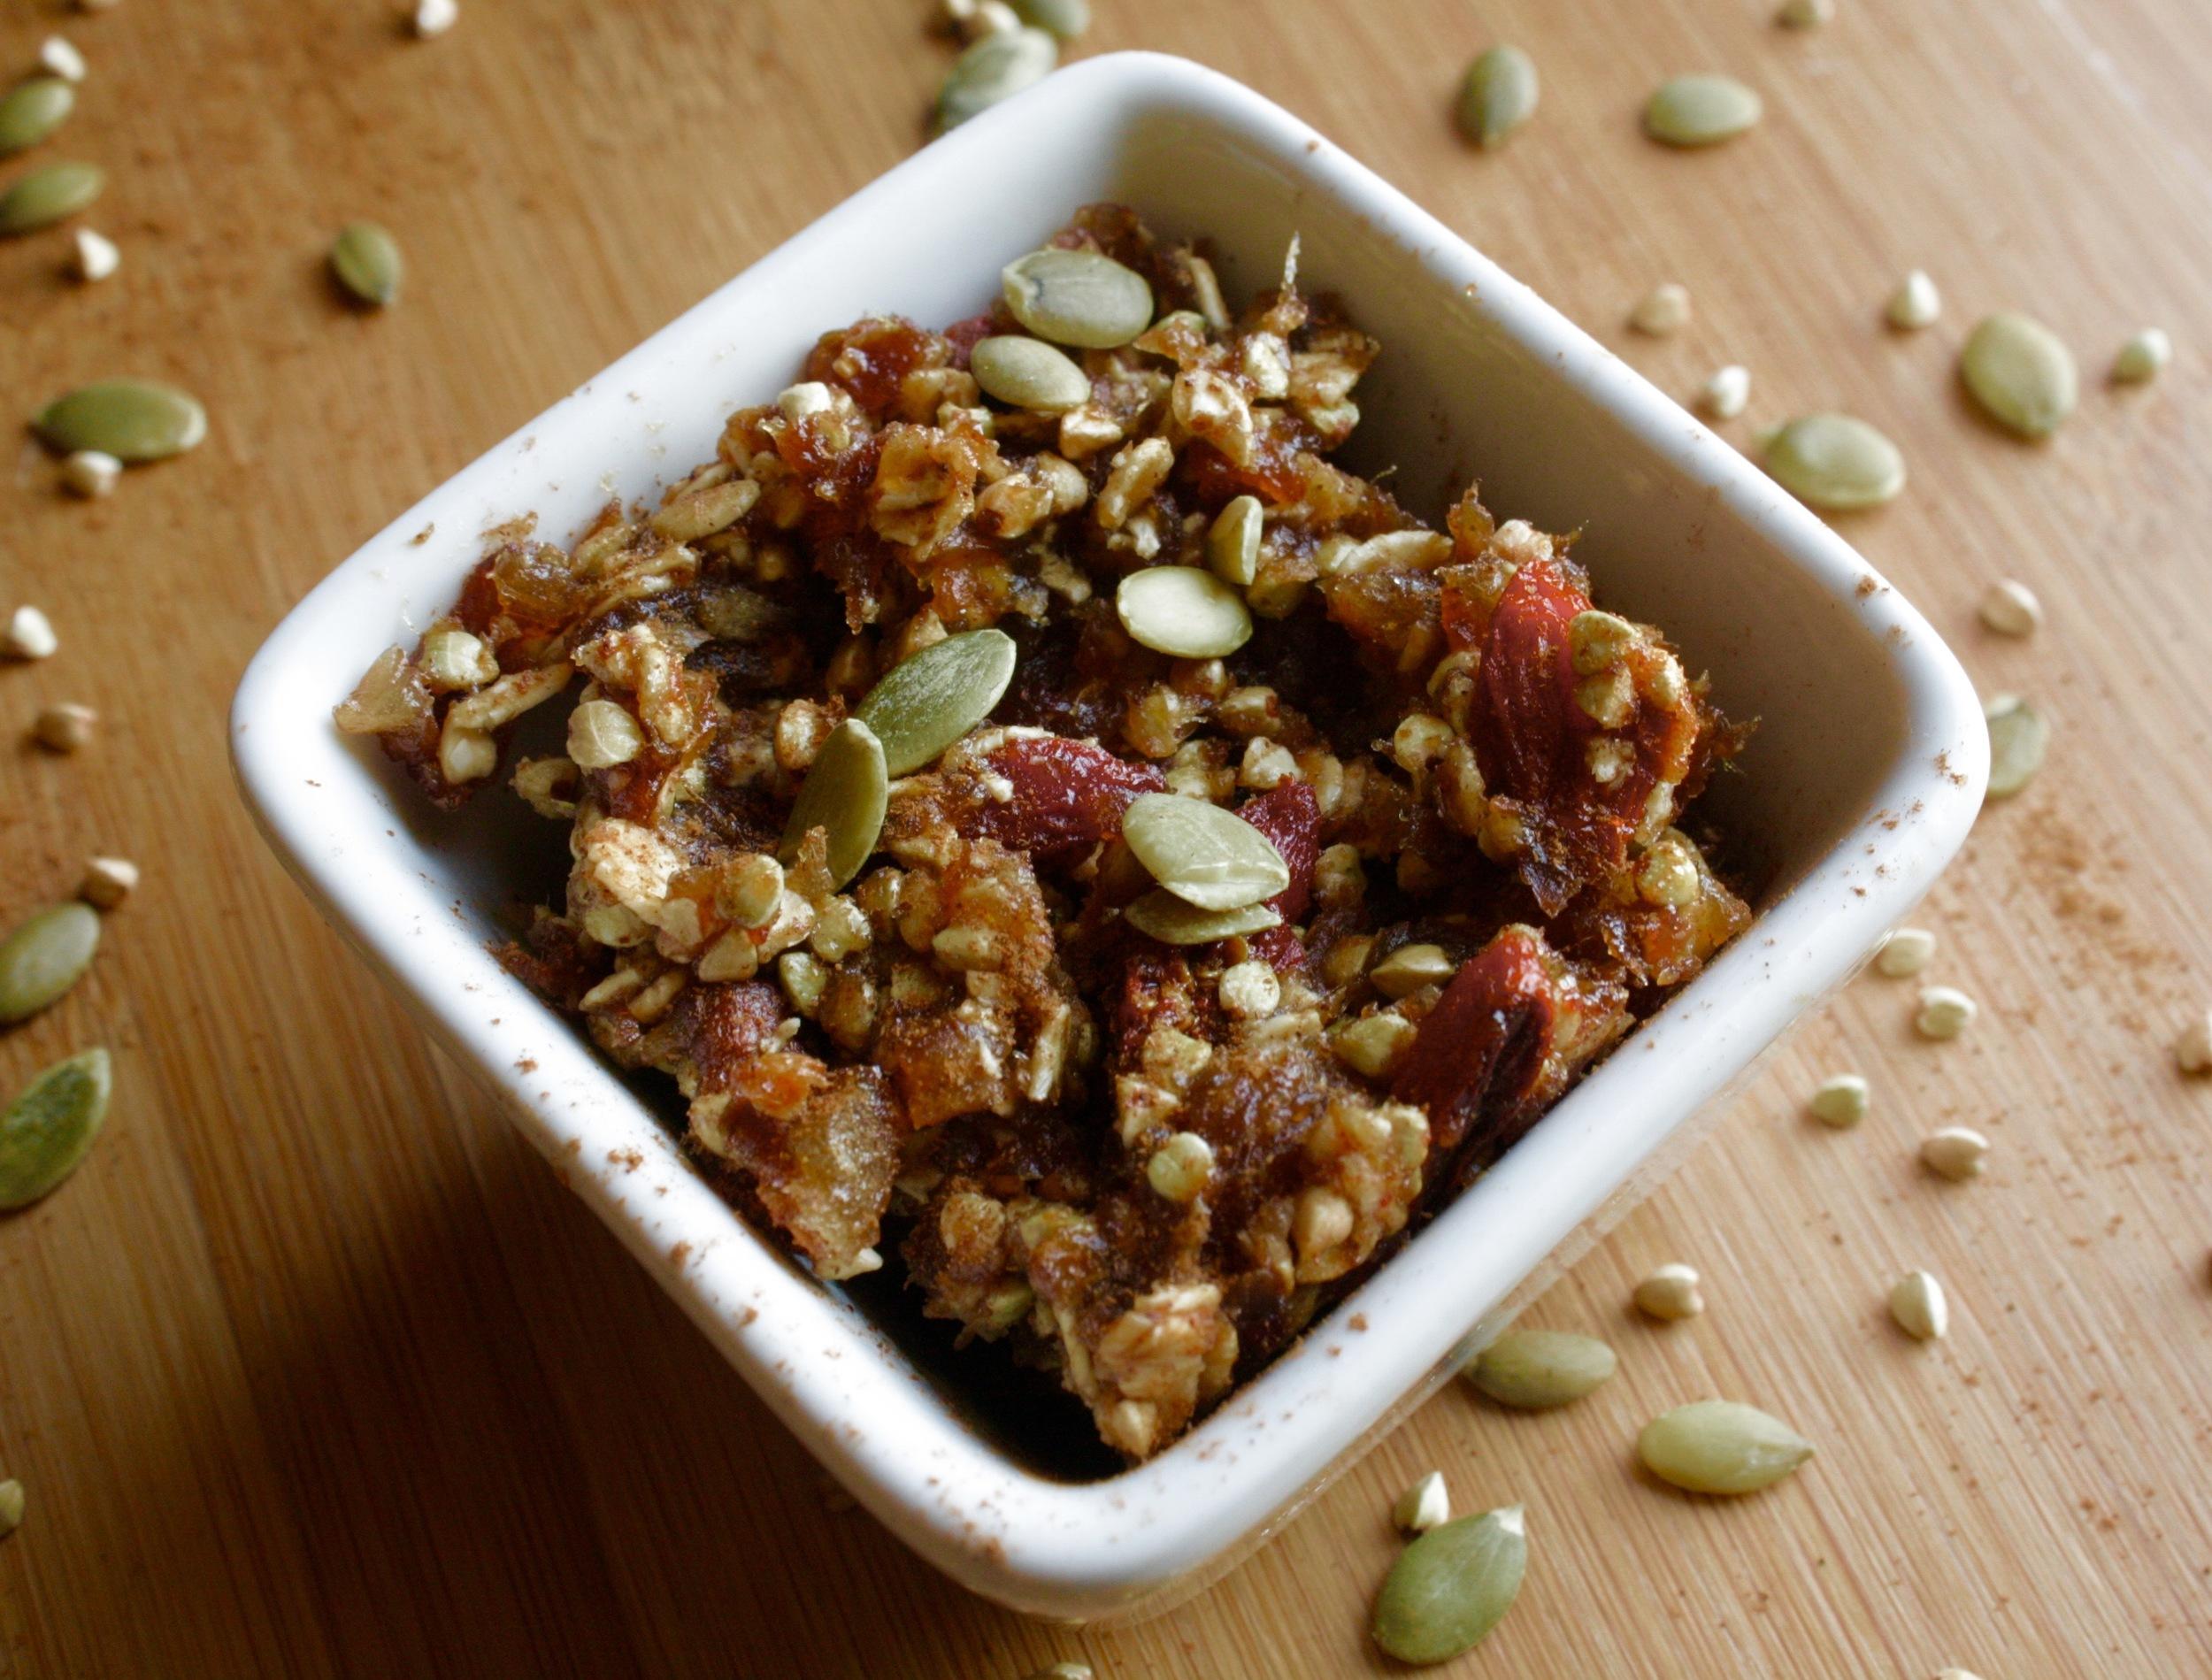 Vegan Fall Breakfast Ideas